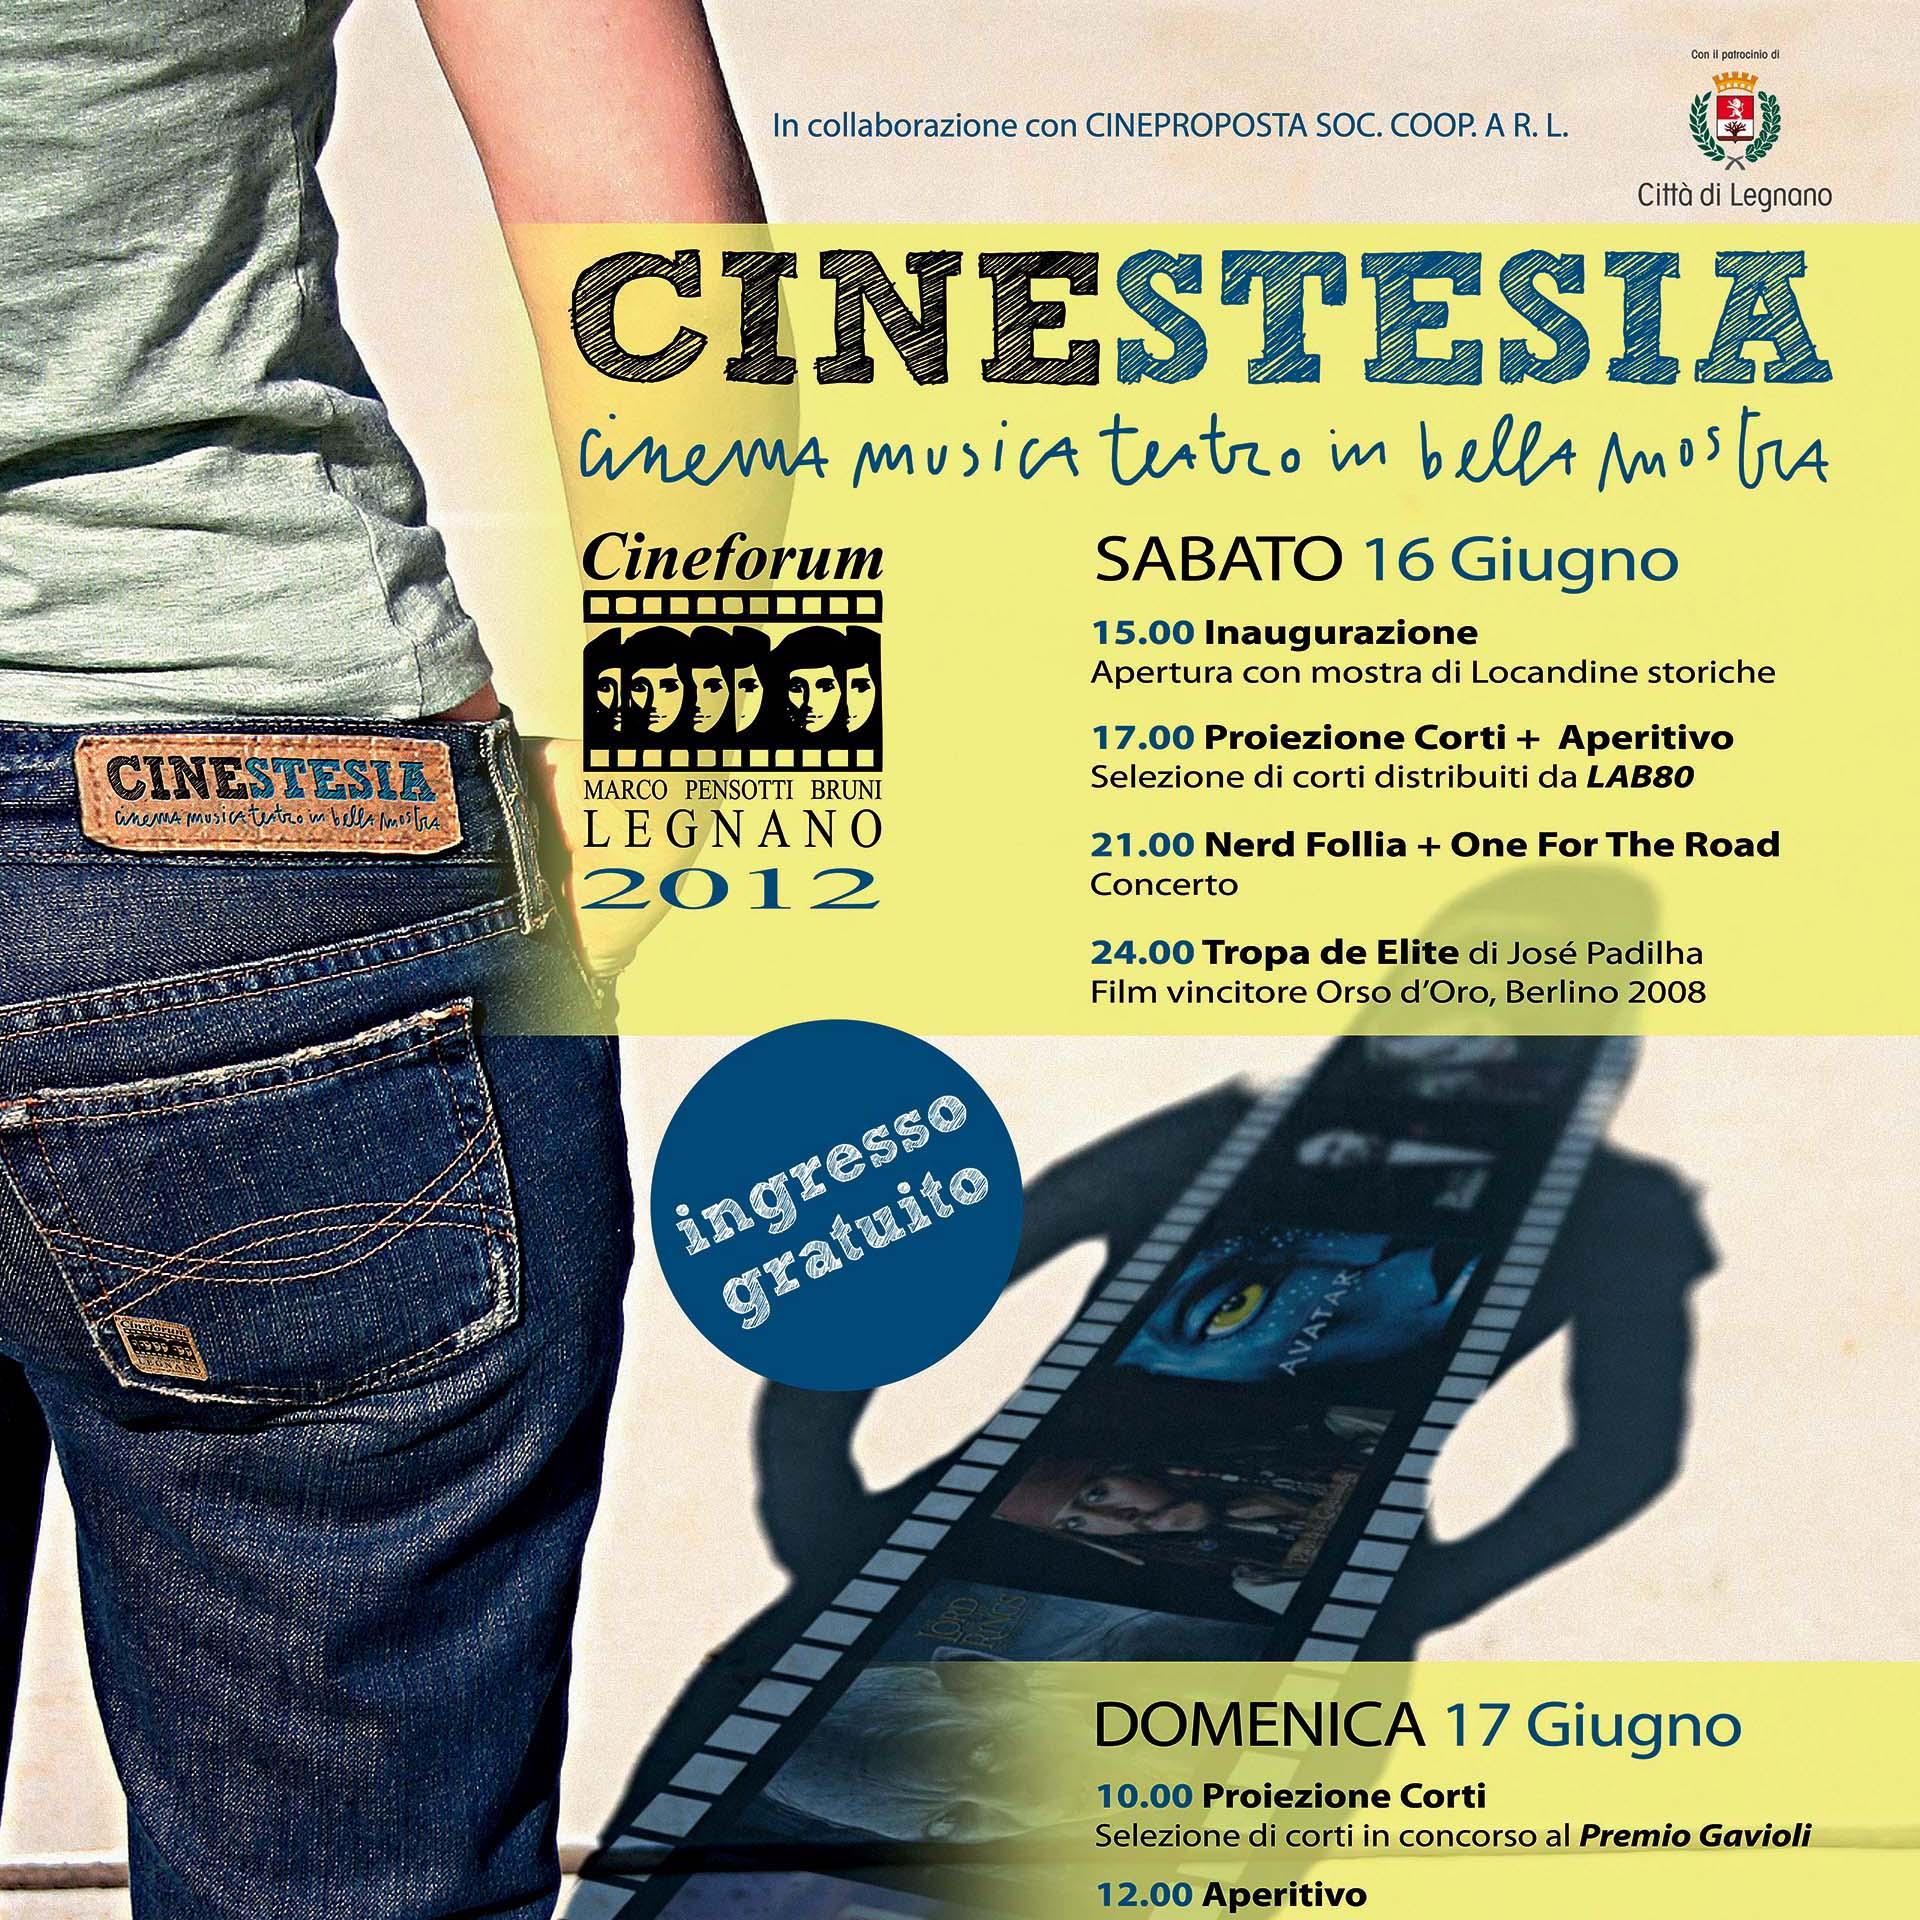 cinestesia_2012_Locandina_sq